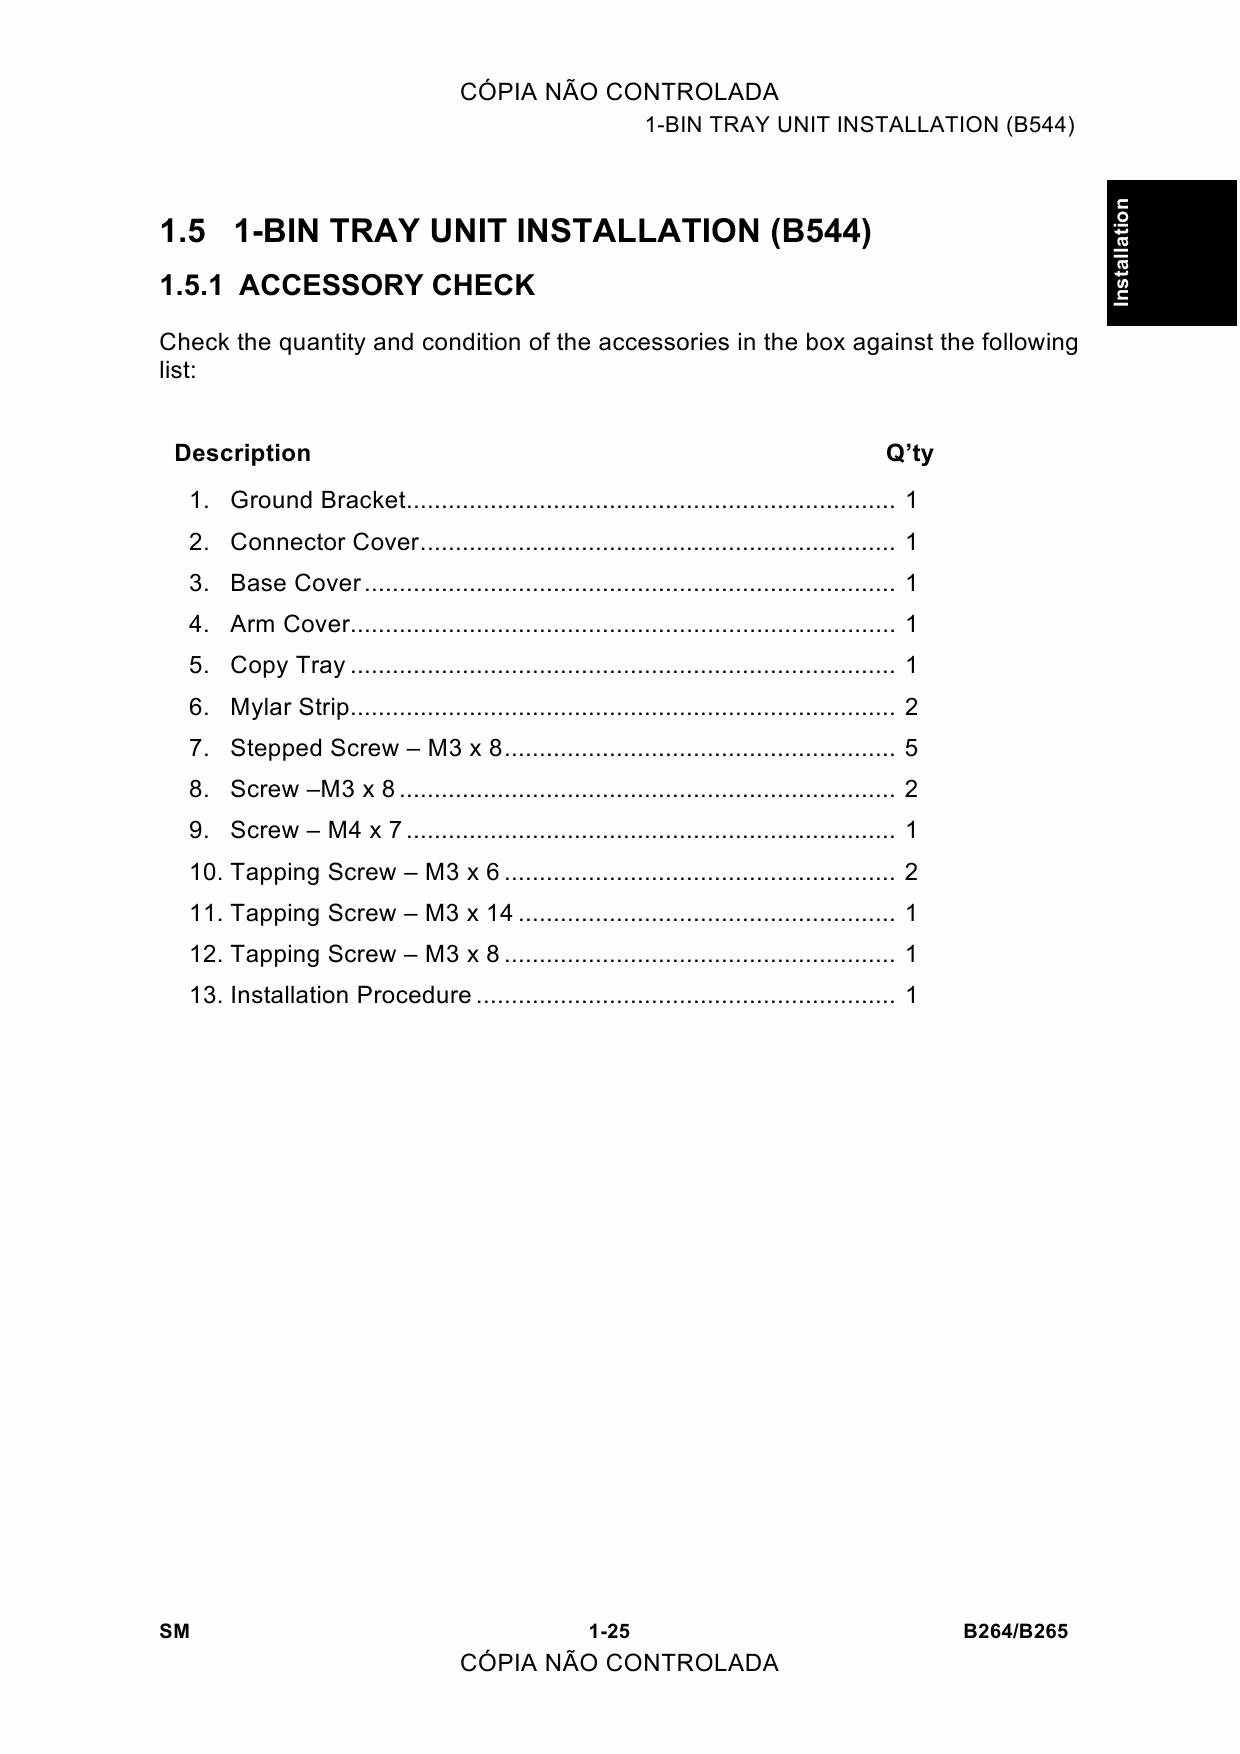 RICOH Aficio 3035 3045 B264 B265 Service Manual-2